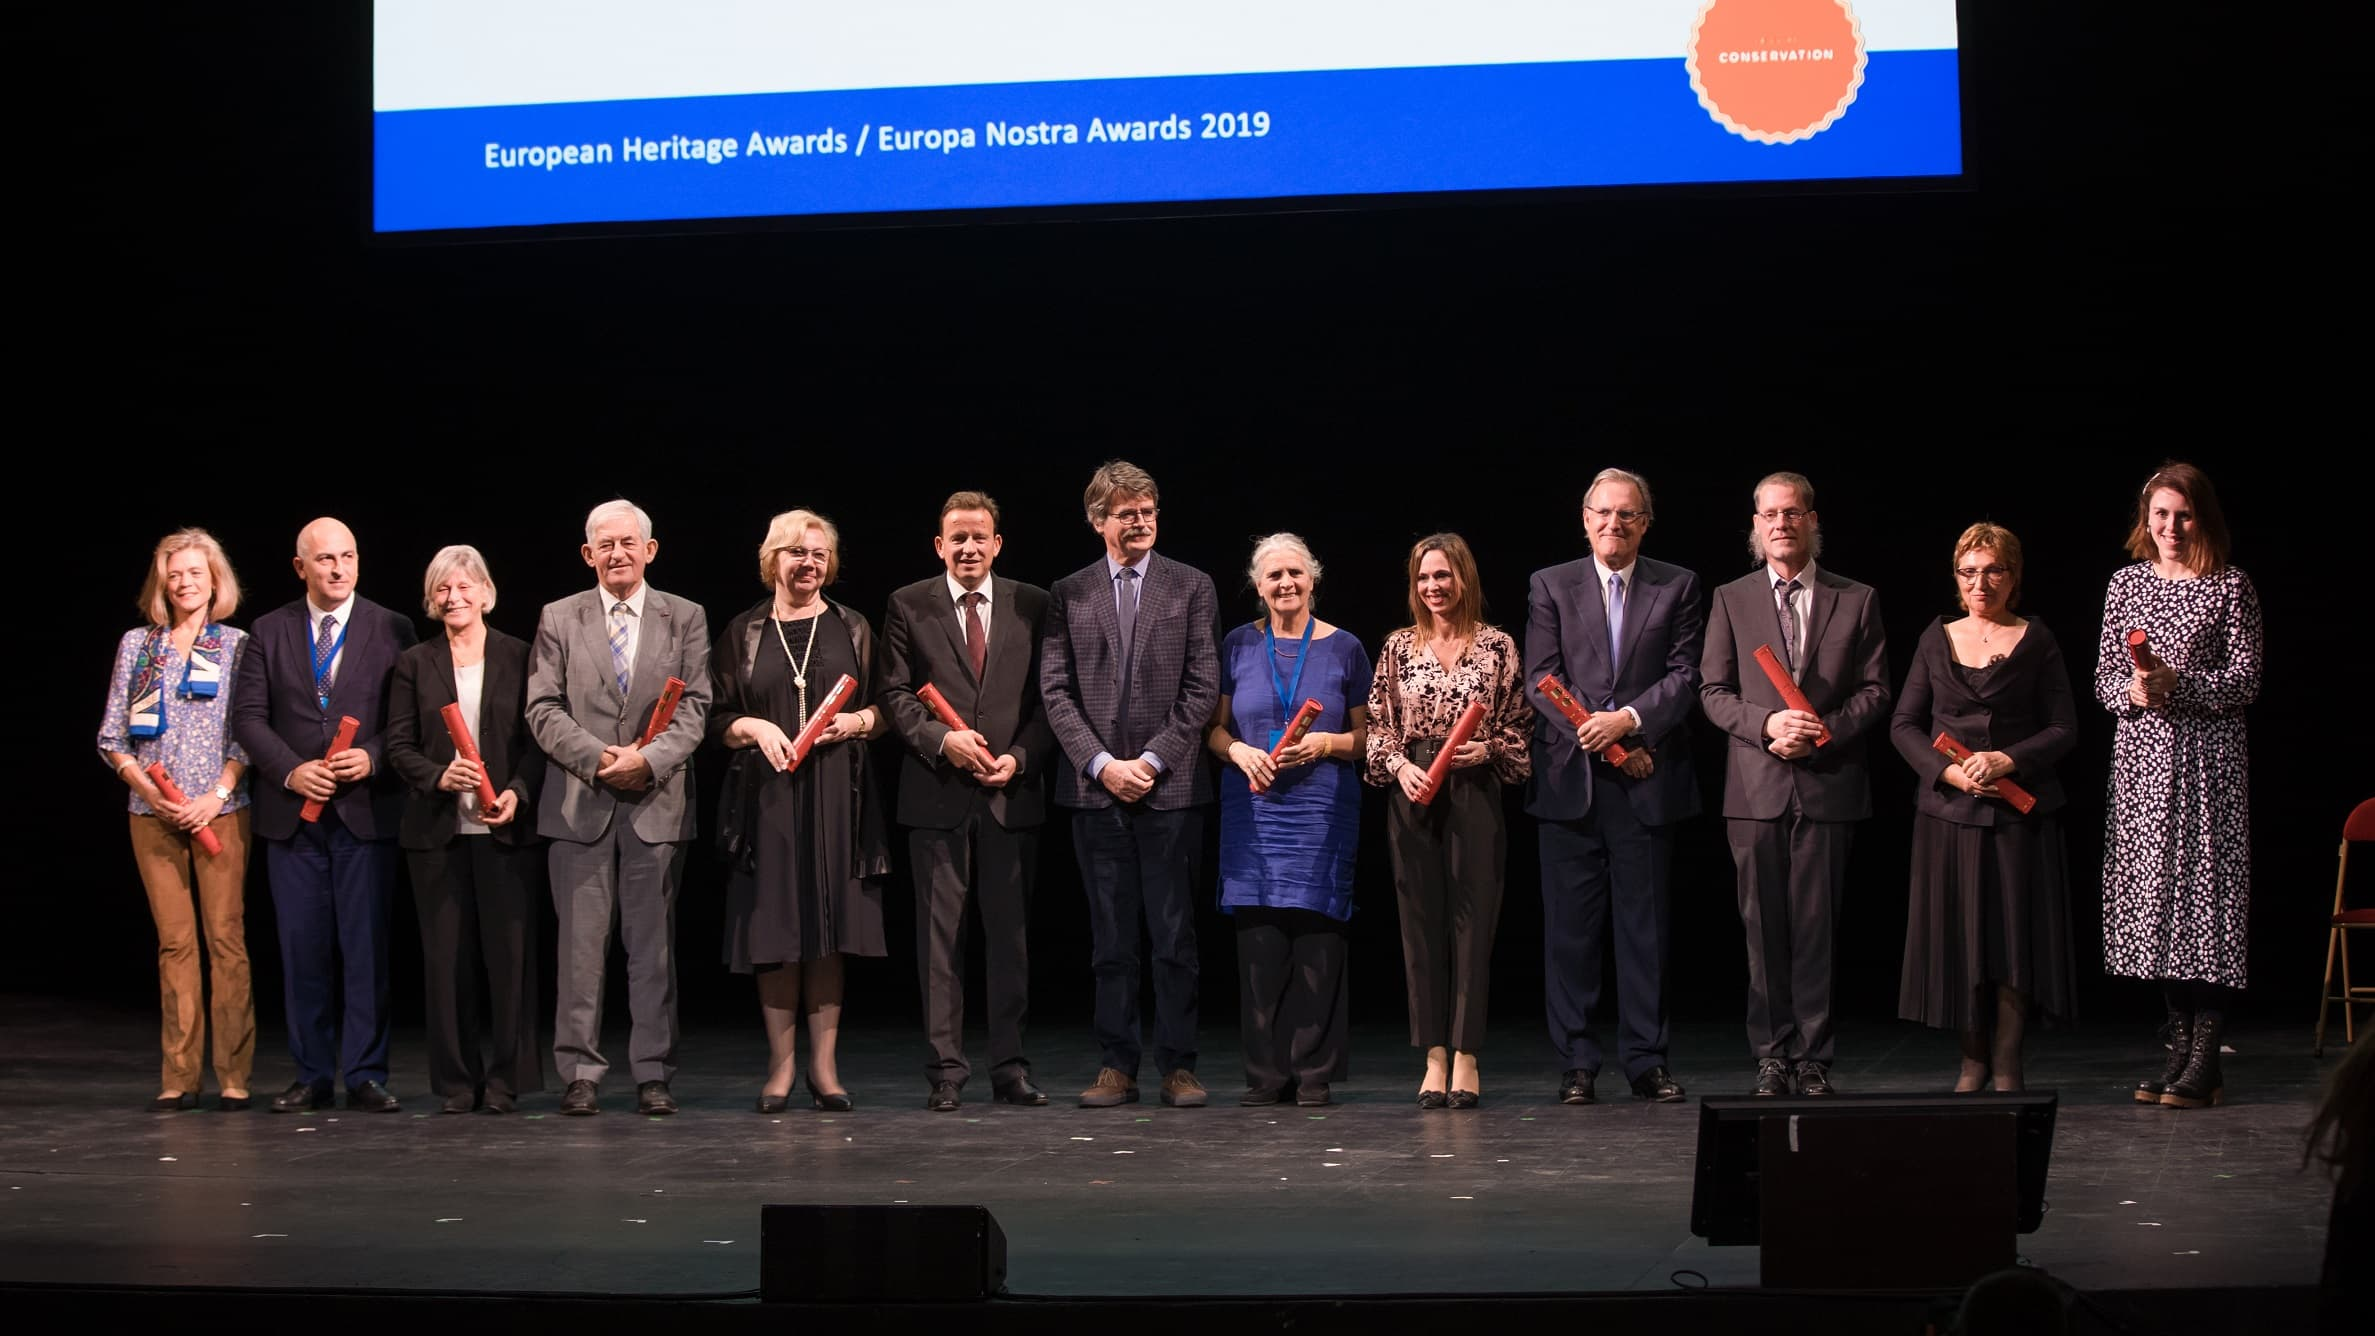 premios europa nostra 2019